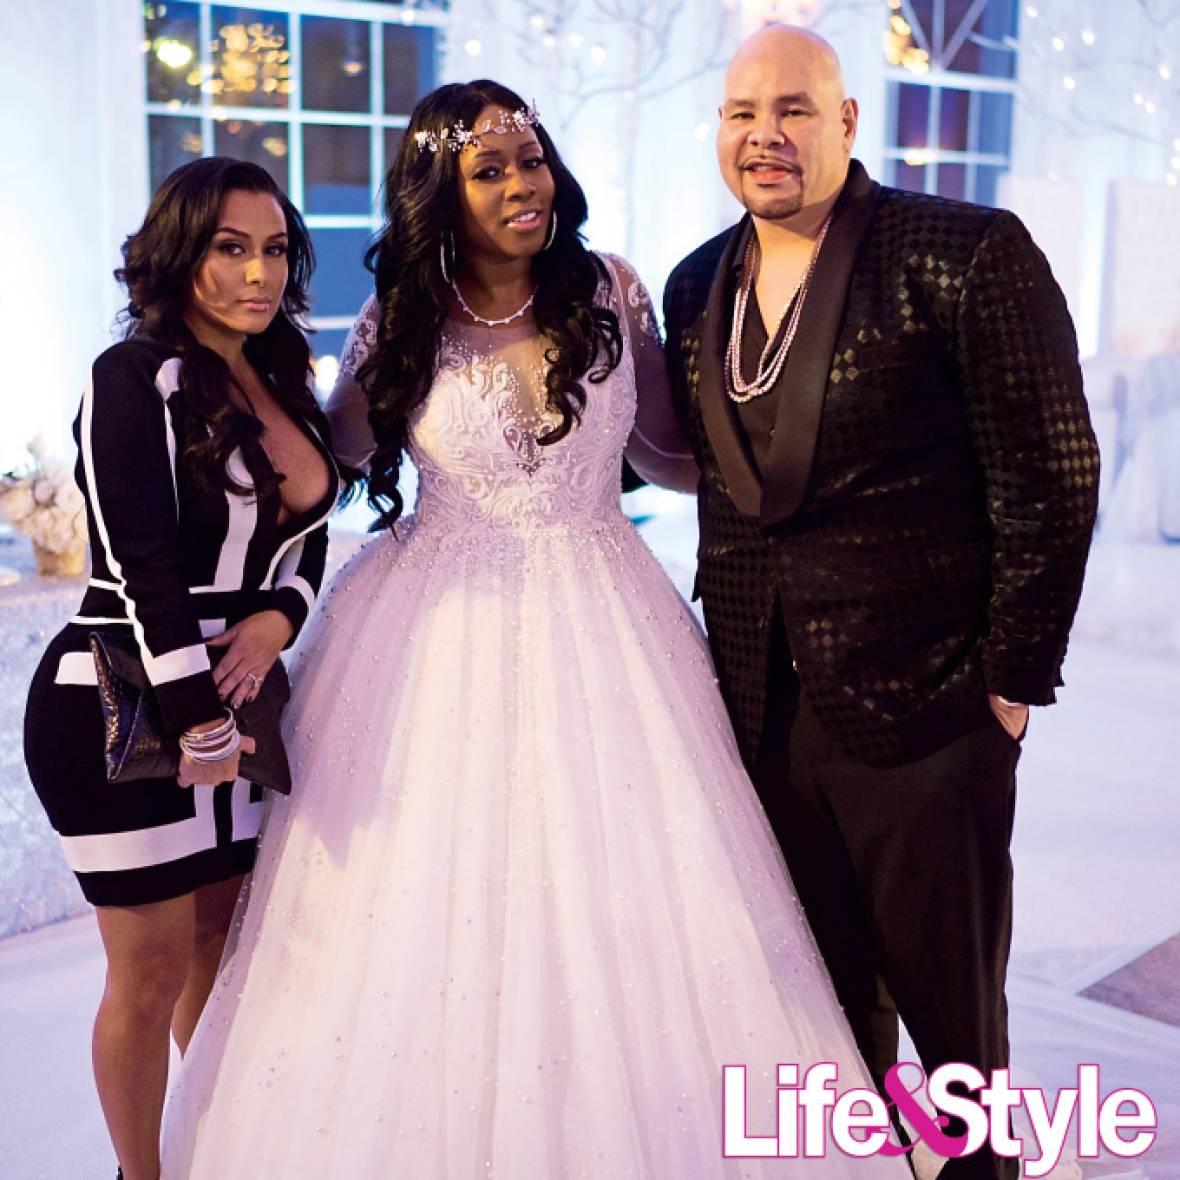 remy-papoose-fat-joe-wedding-love-hip-hop